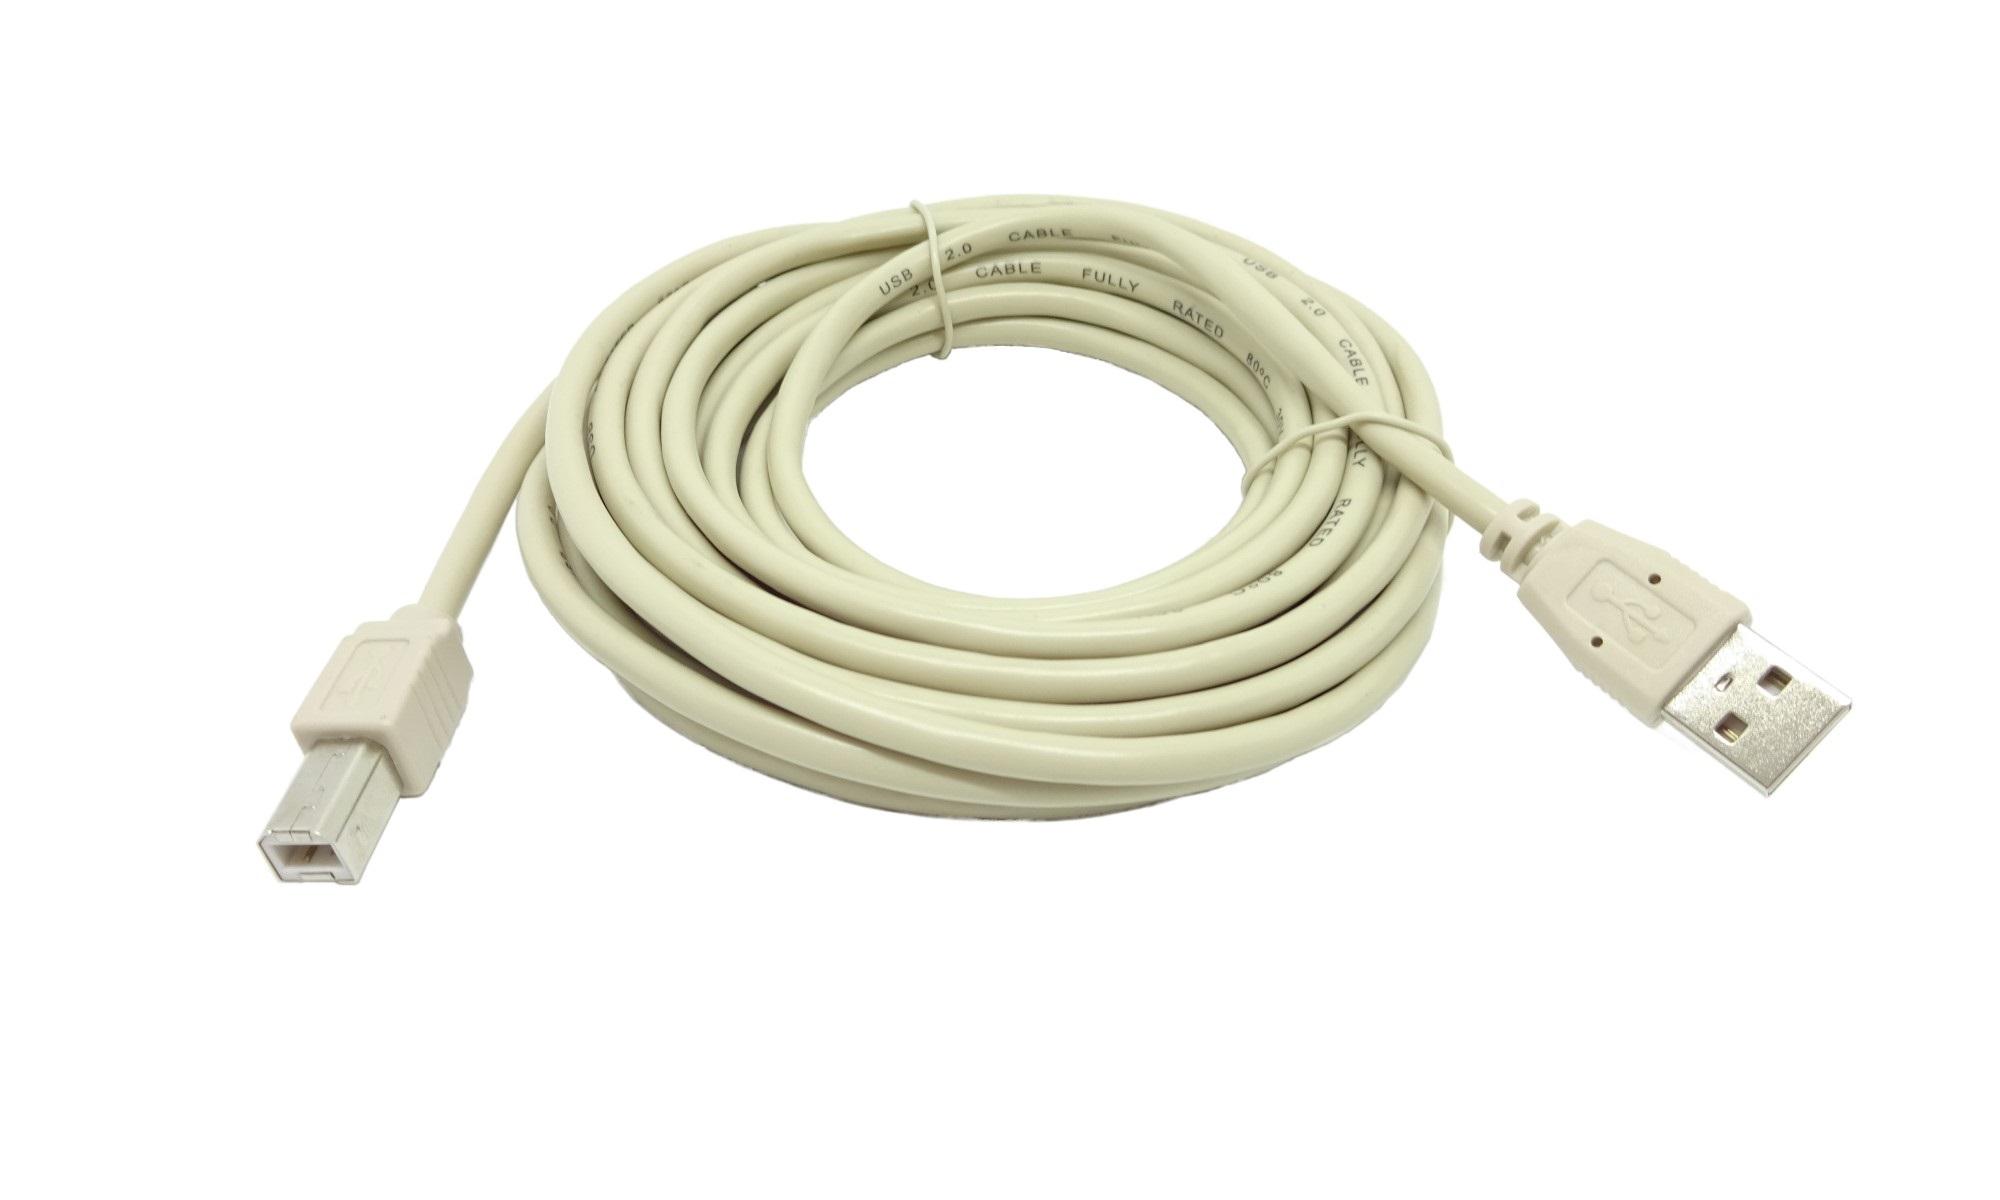 Cablu USB 2.0 A - B pentru imprimanta, 5 m, crem